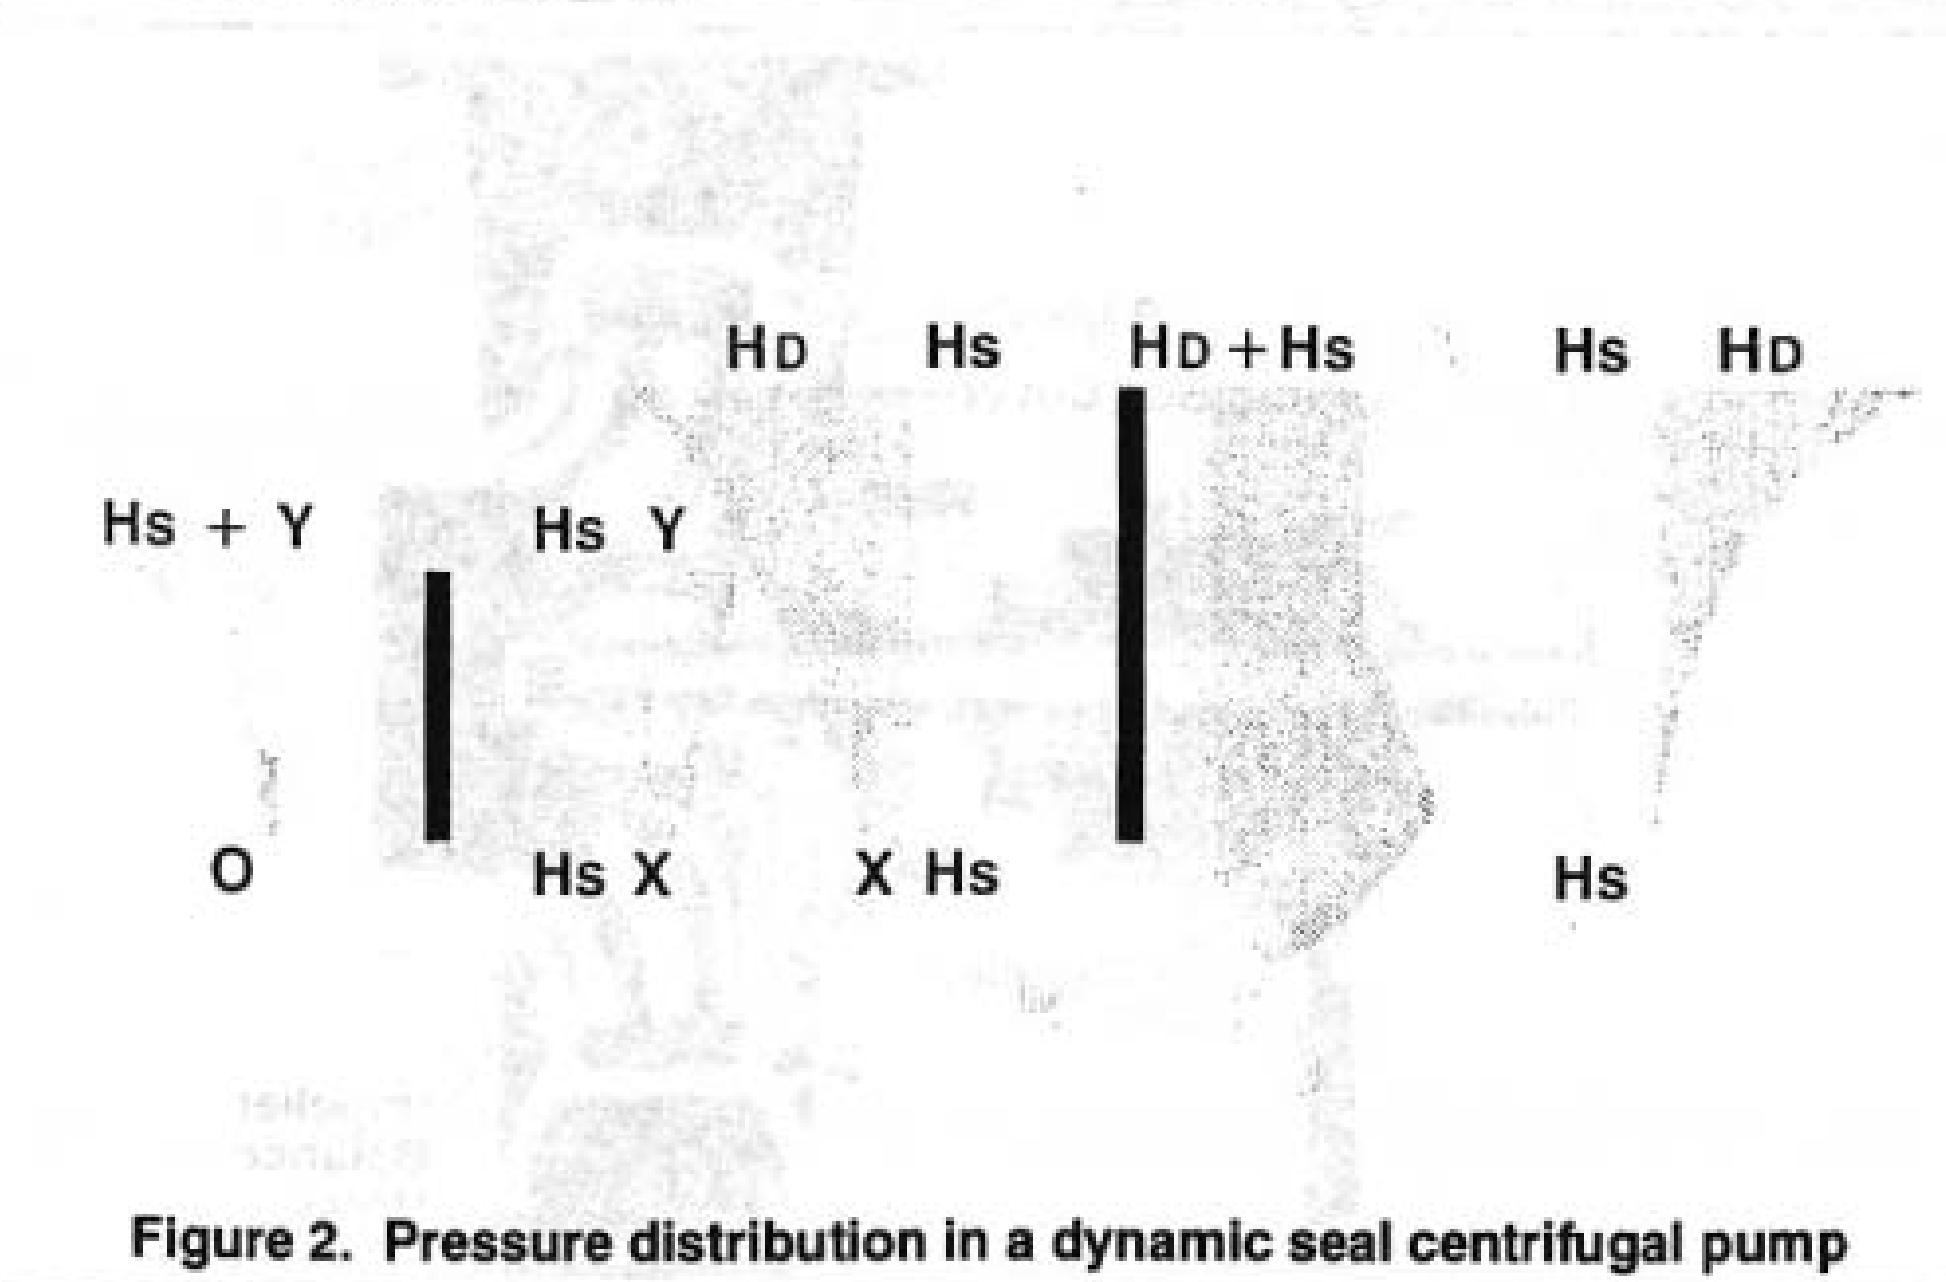 Pump Pressure Distribution in a Hydrodynamically Sealed Centrifugal Pump - figure 2